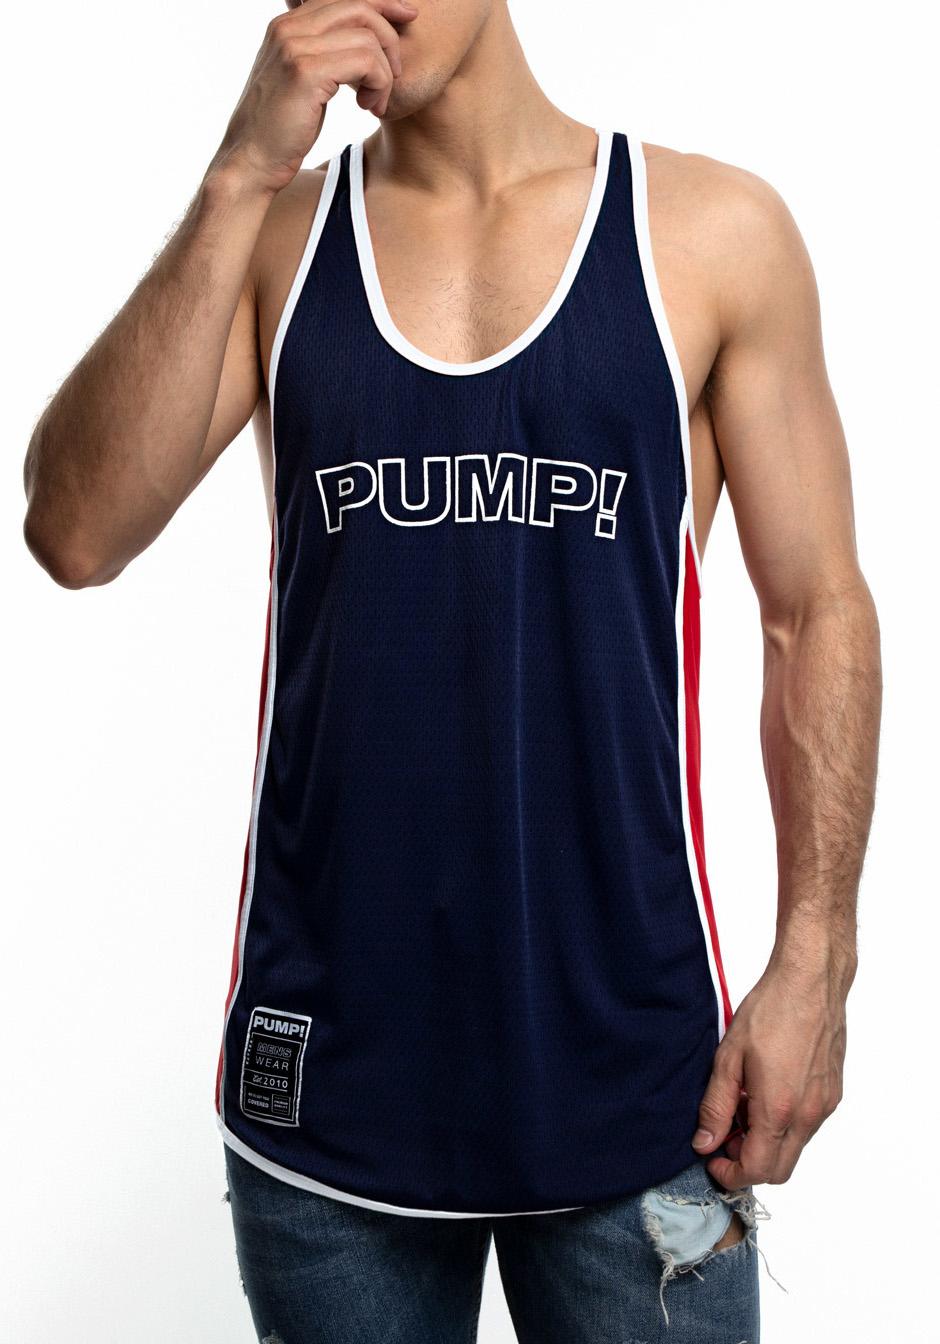 PUMP! Academy deep Tank | navy/white/red